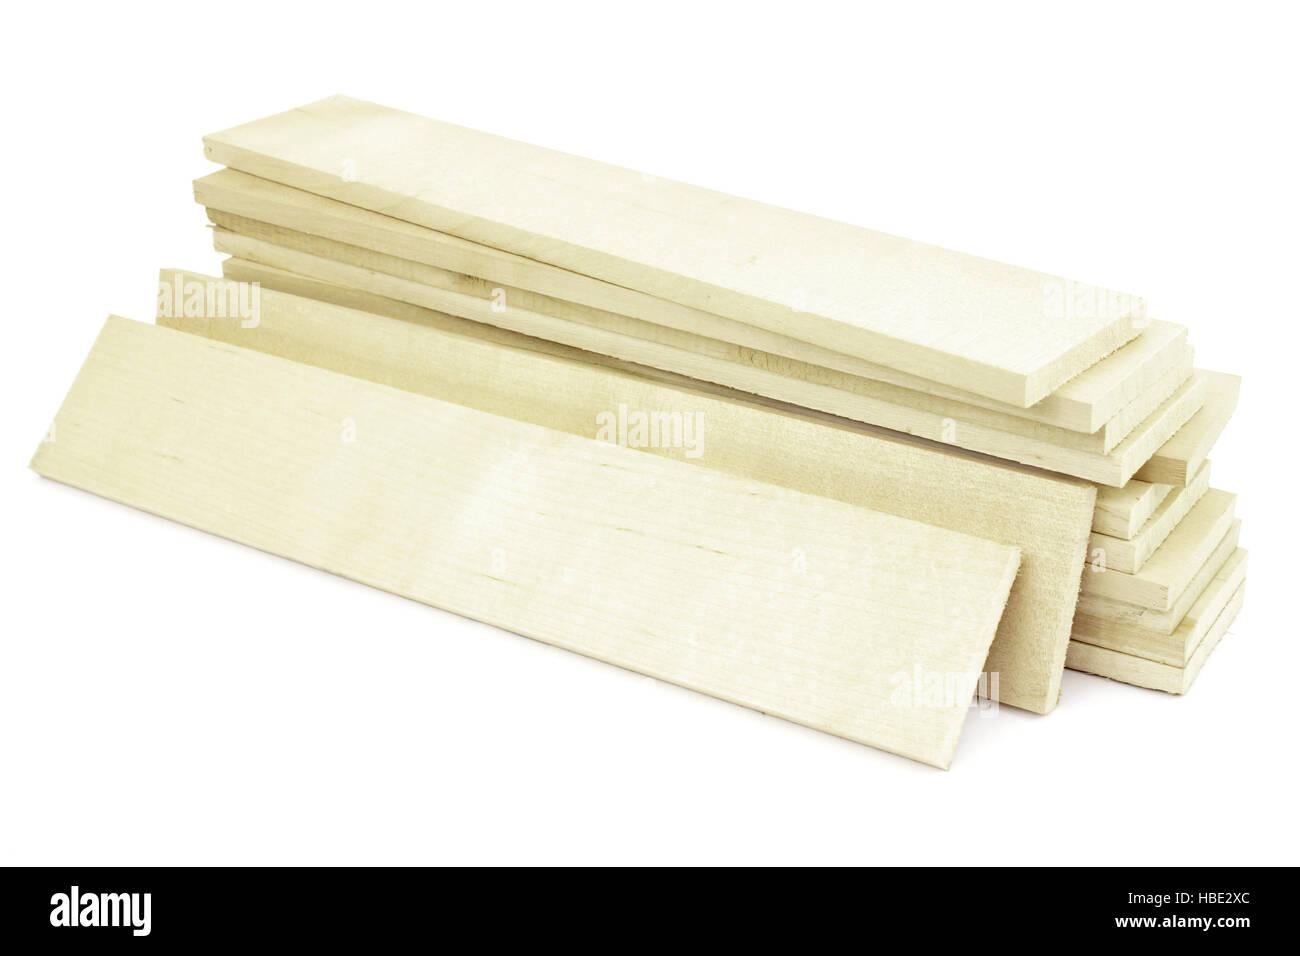 Planed Wooden planks - Stock Image